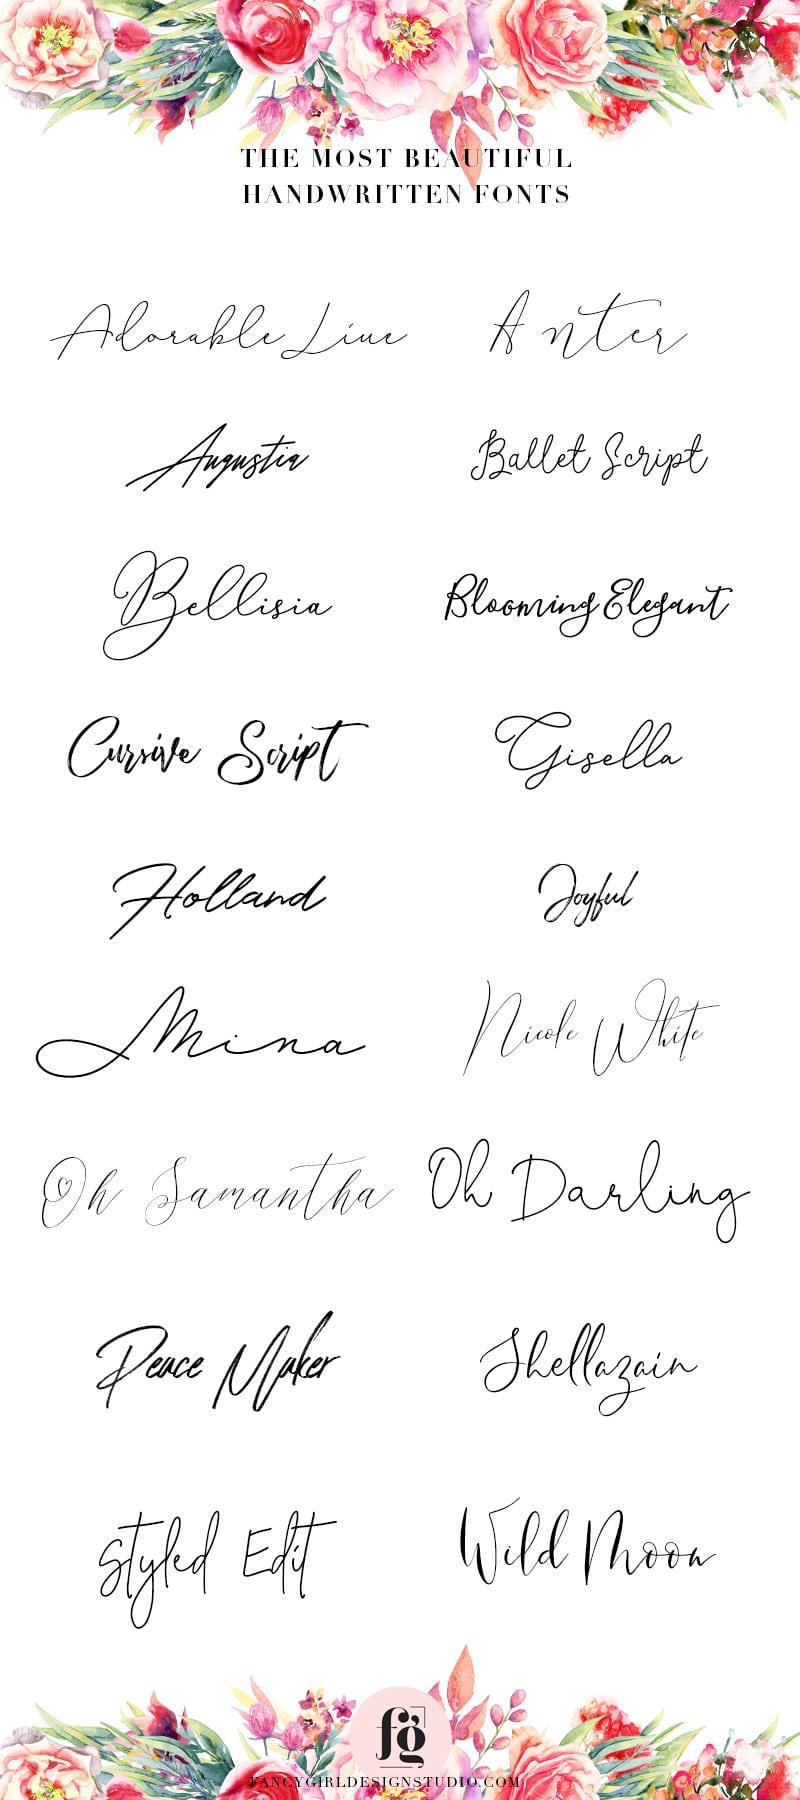 most beautiful handwritten fonts